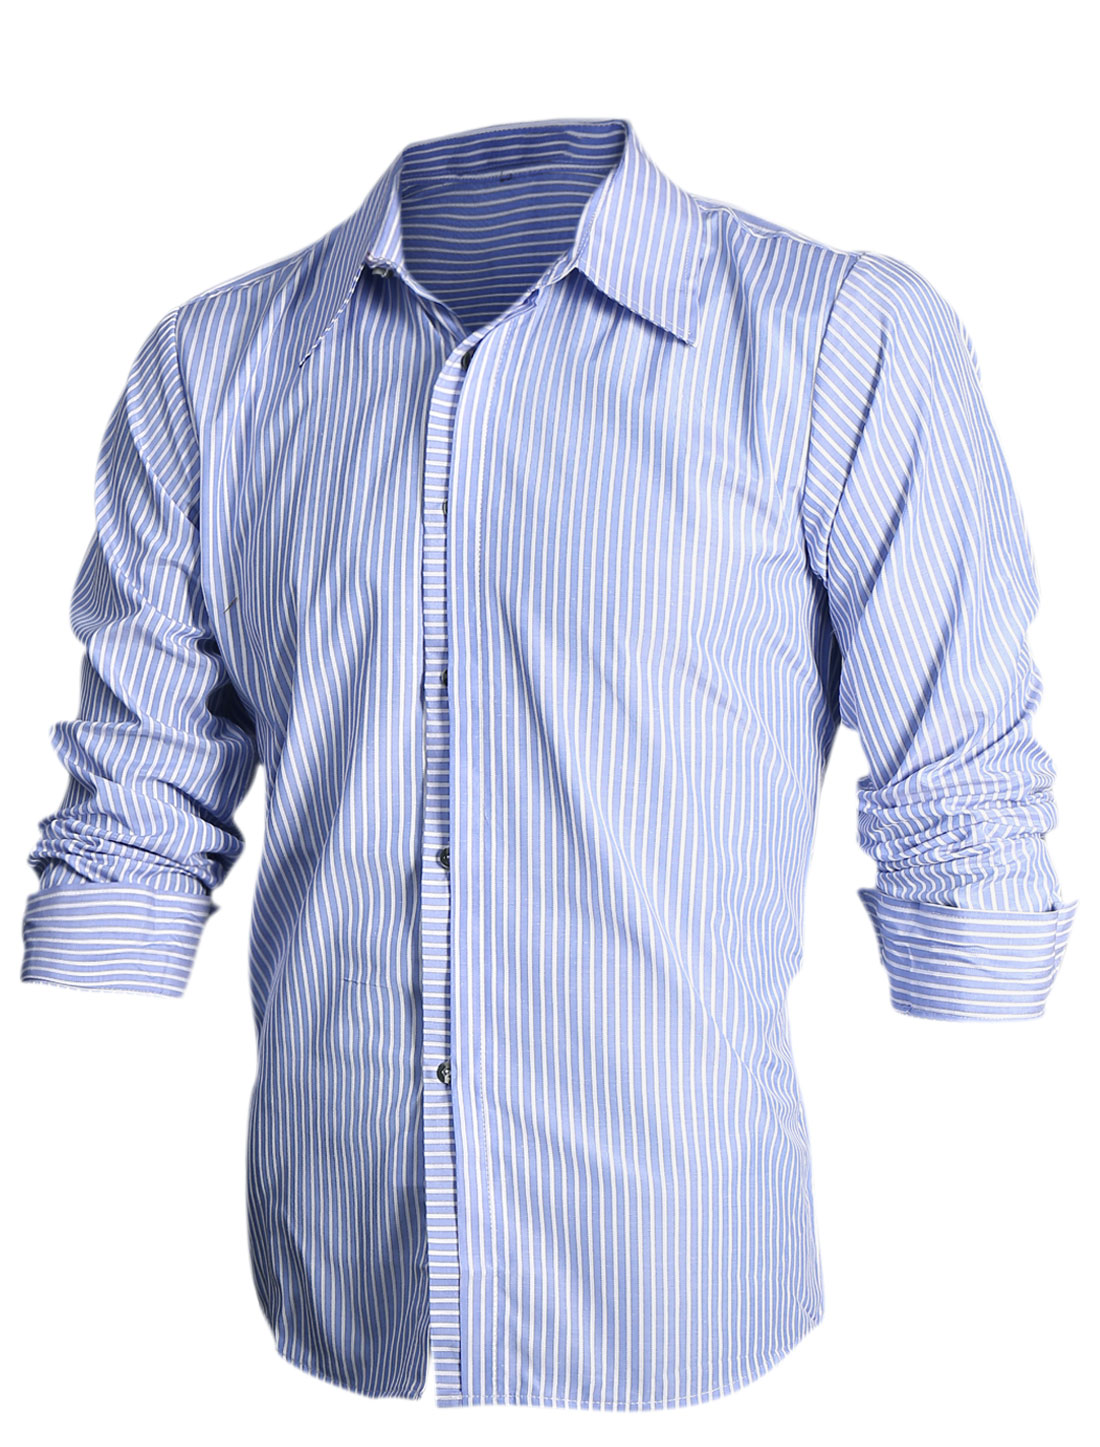 Men Vertical Stripes Pattern Button-Front Slim Fit Top Shirt Light Blue White M